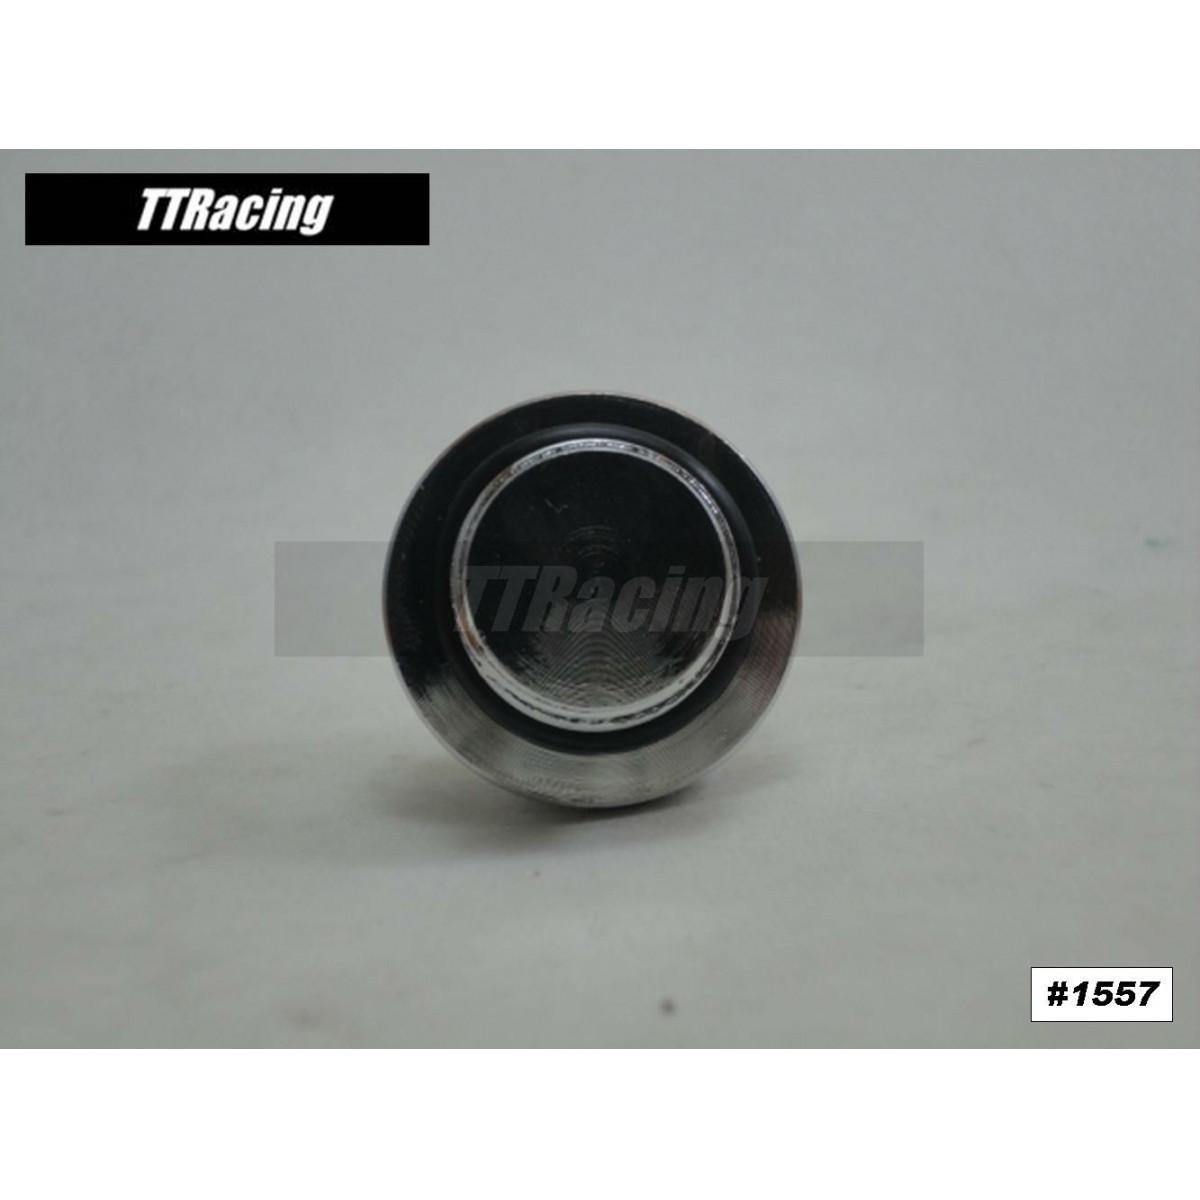 Tampa do óleo Suzuki V-Strom Bandit Gsxr Cromado  - T & T Soluções